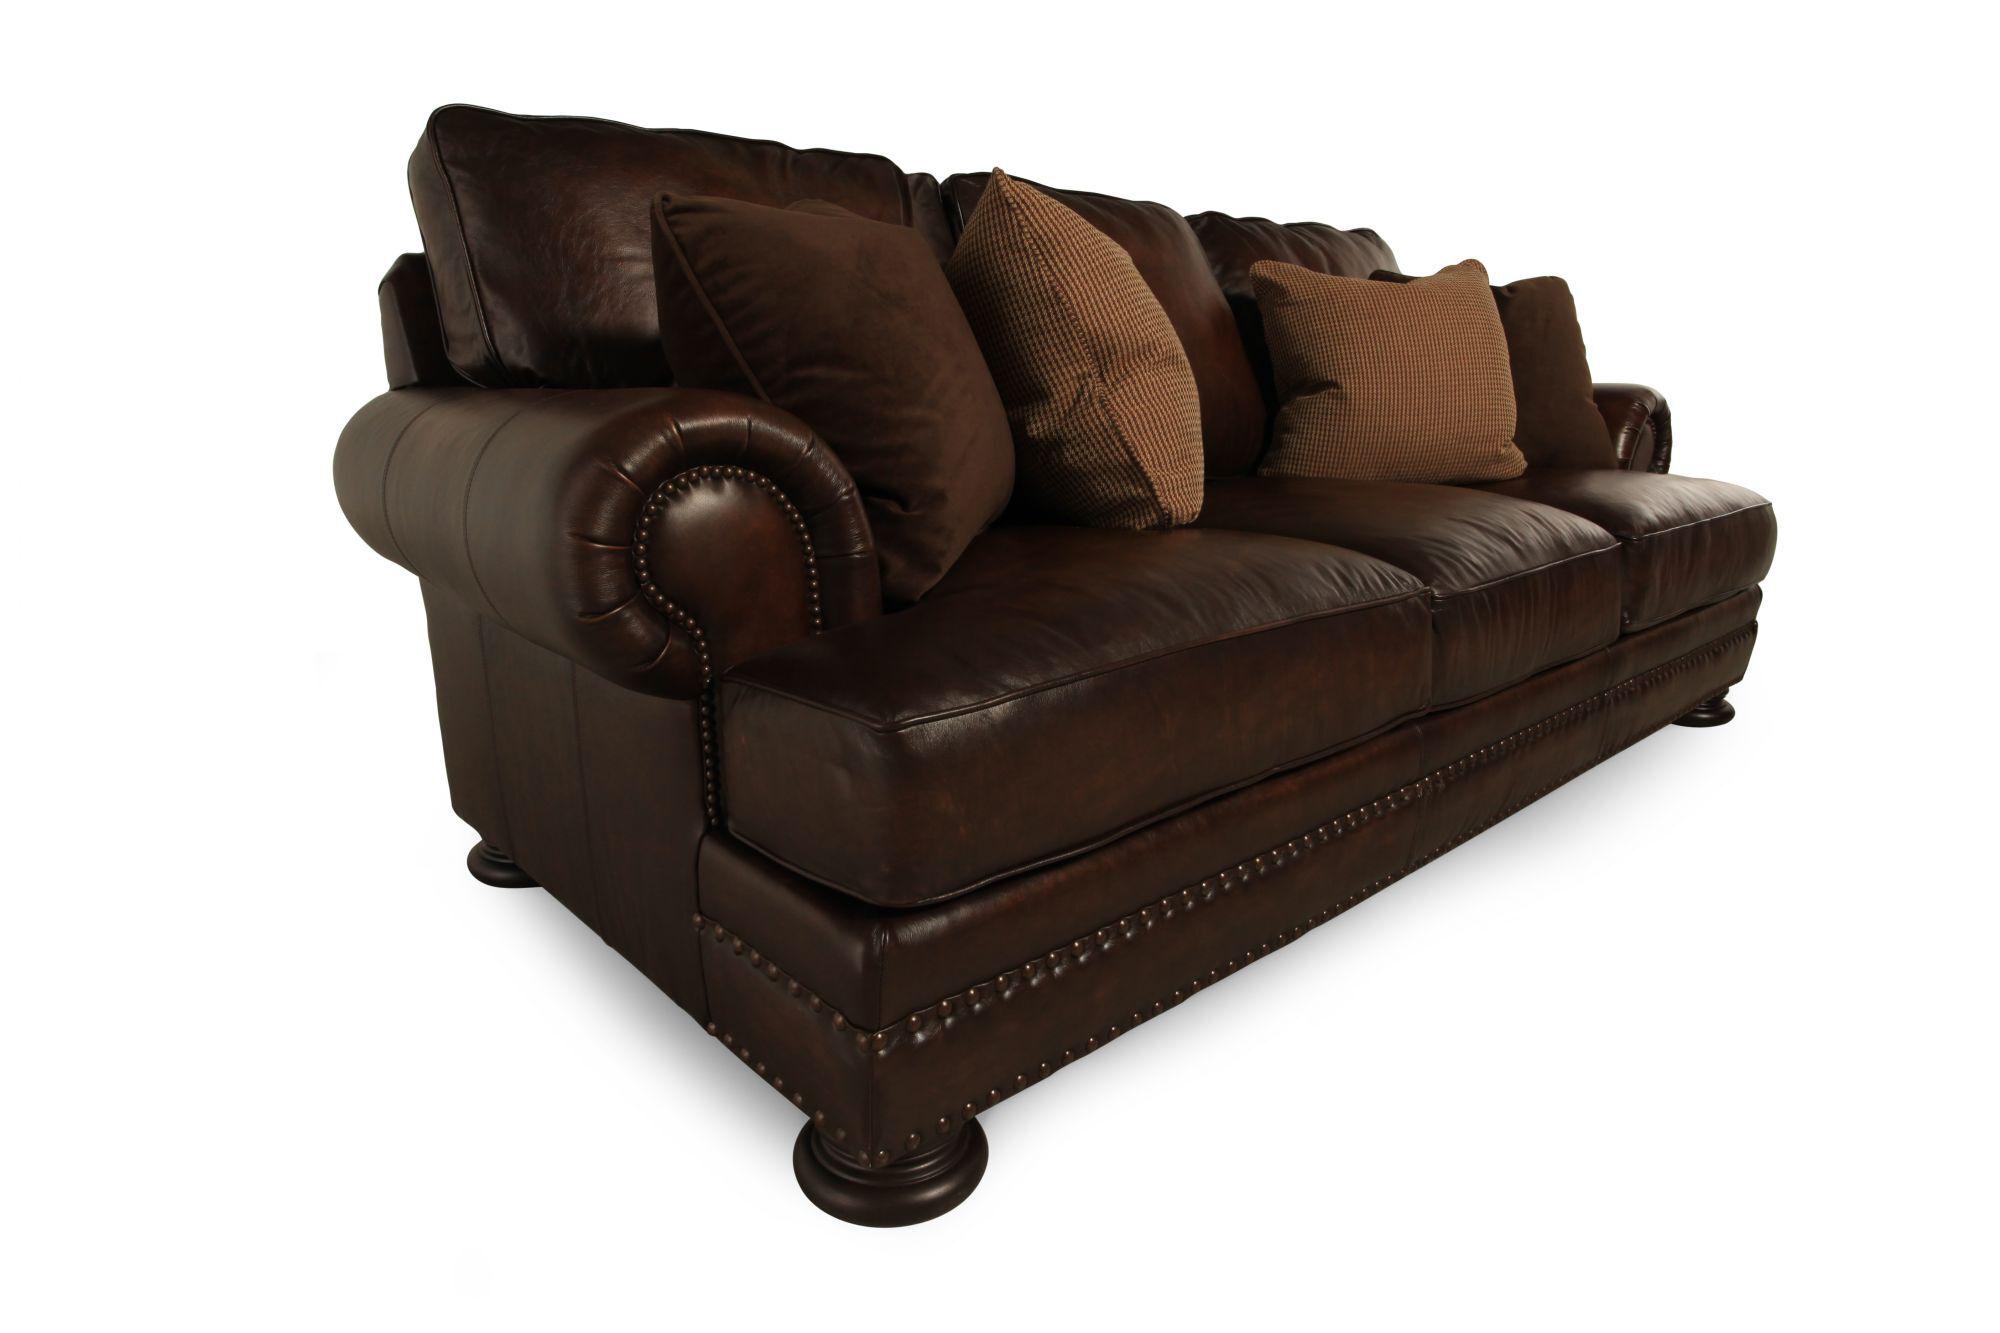 bernhardt breckenridge sofa three seat bed covers foster leather  thesofa